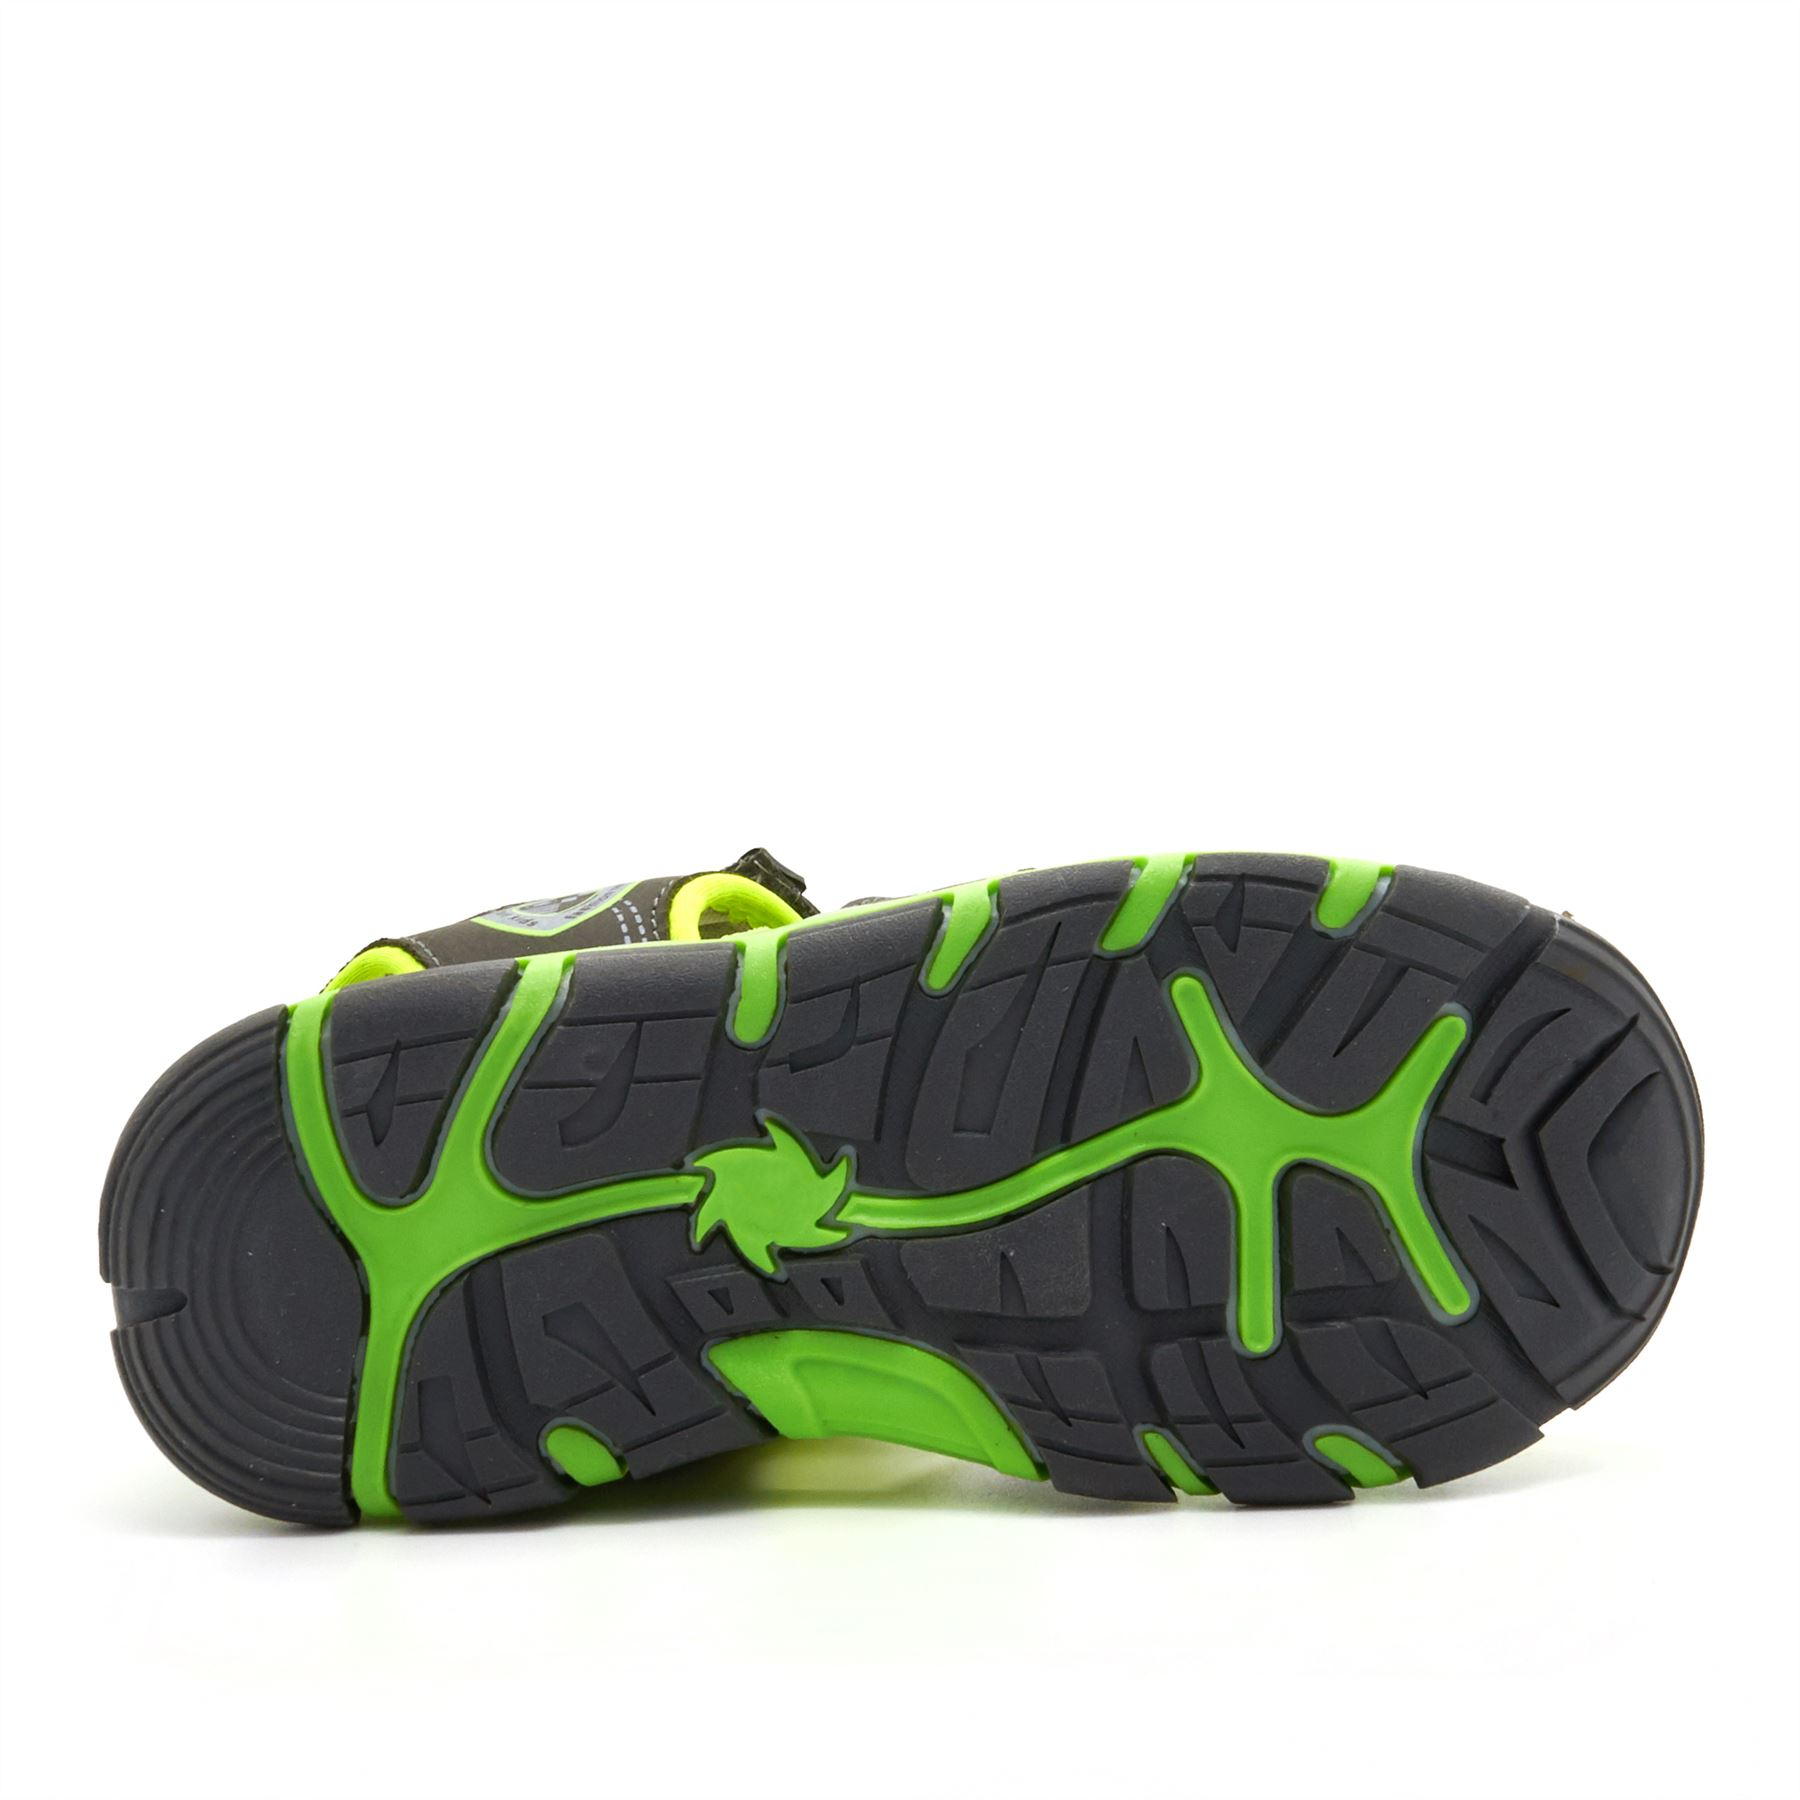 New Boys Kids Casual Sandals Summer Beach Sports Walking Touch Fasten Strap 7-12